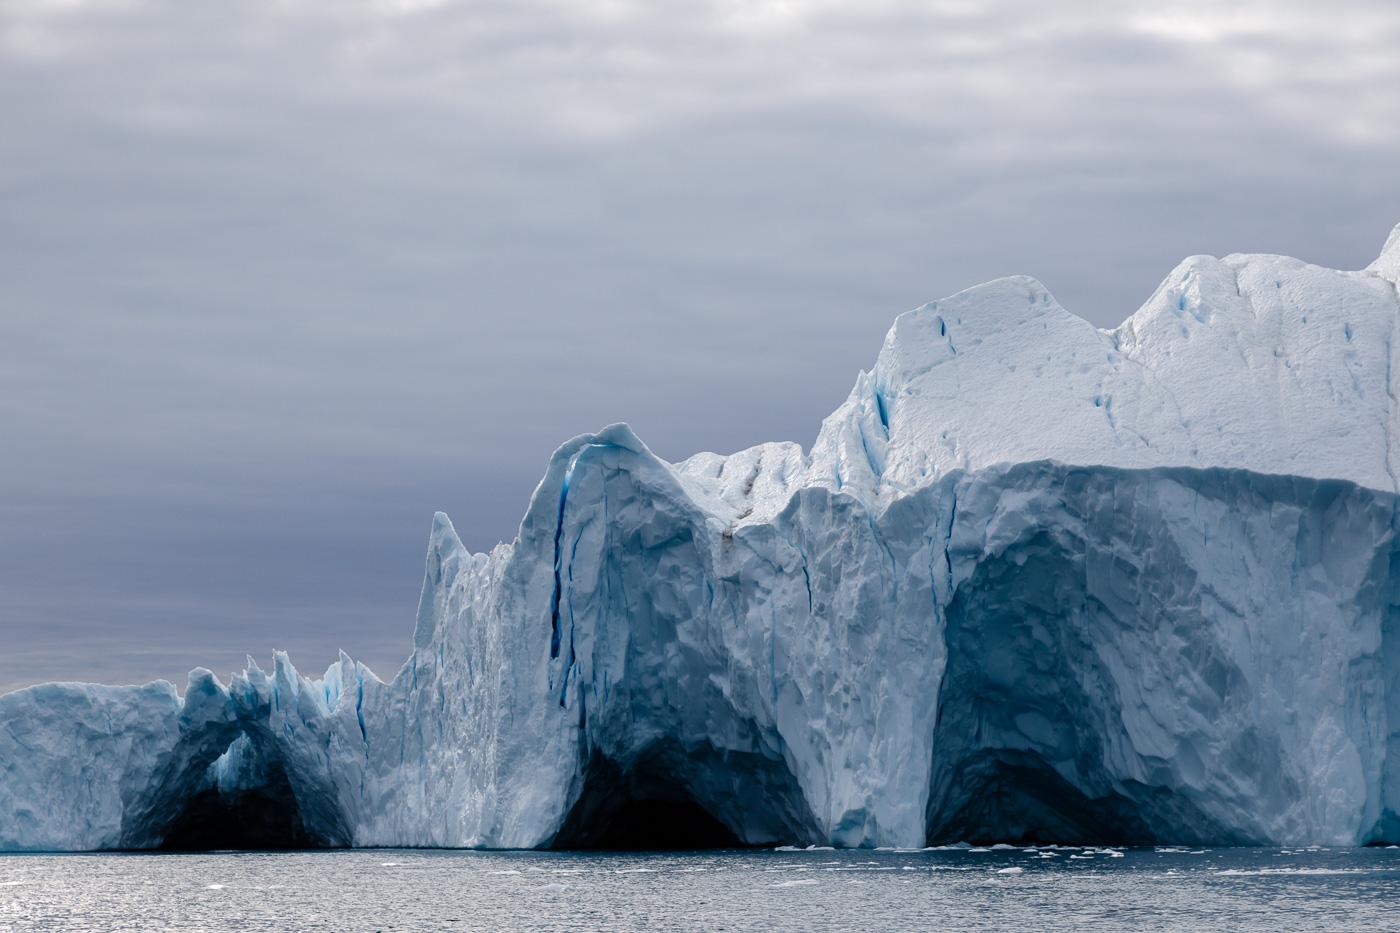 Icebergs off the coast of Greenland